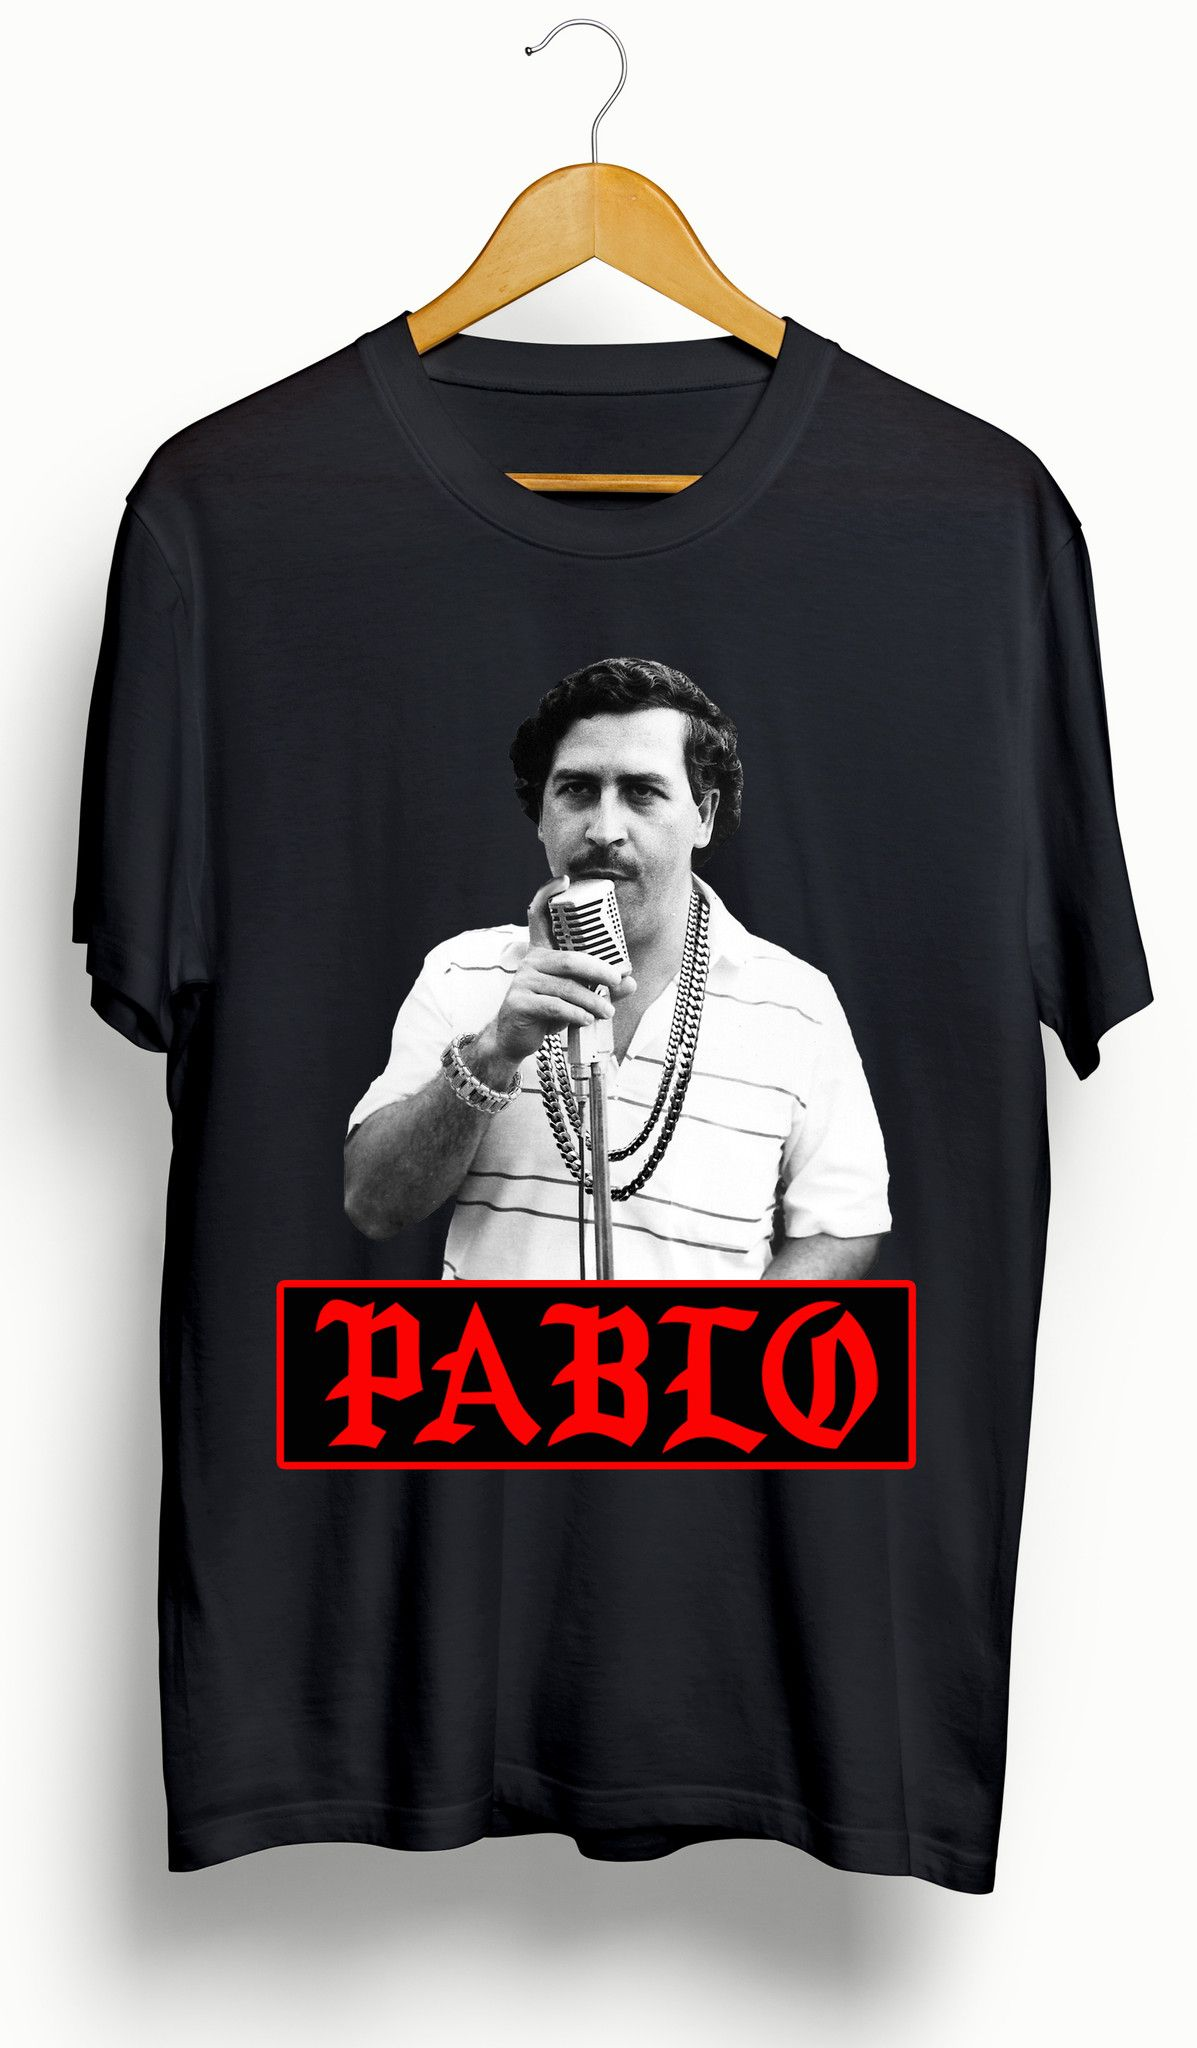 cb8d4649 Pablo Escobar/Life of Pablo/Yeezy/I Feel Like Pablo T-Shirt | I feel ...